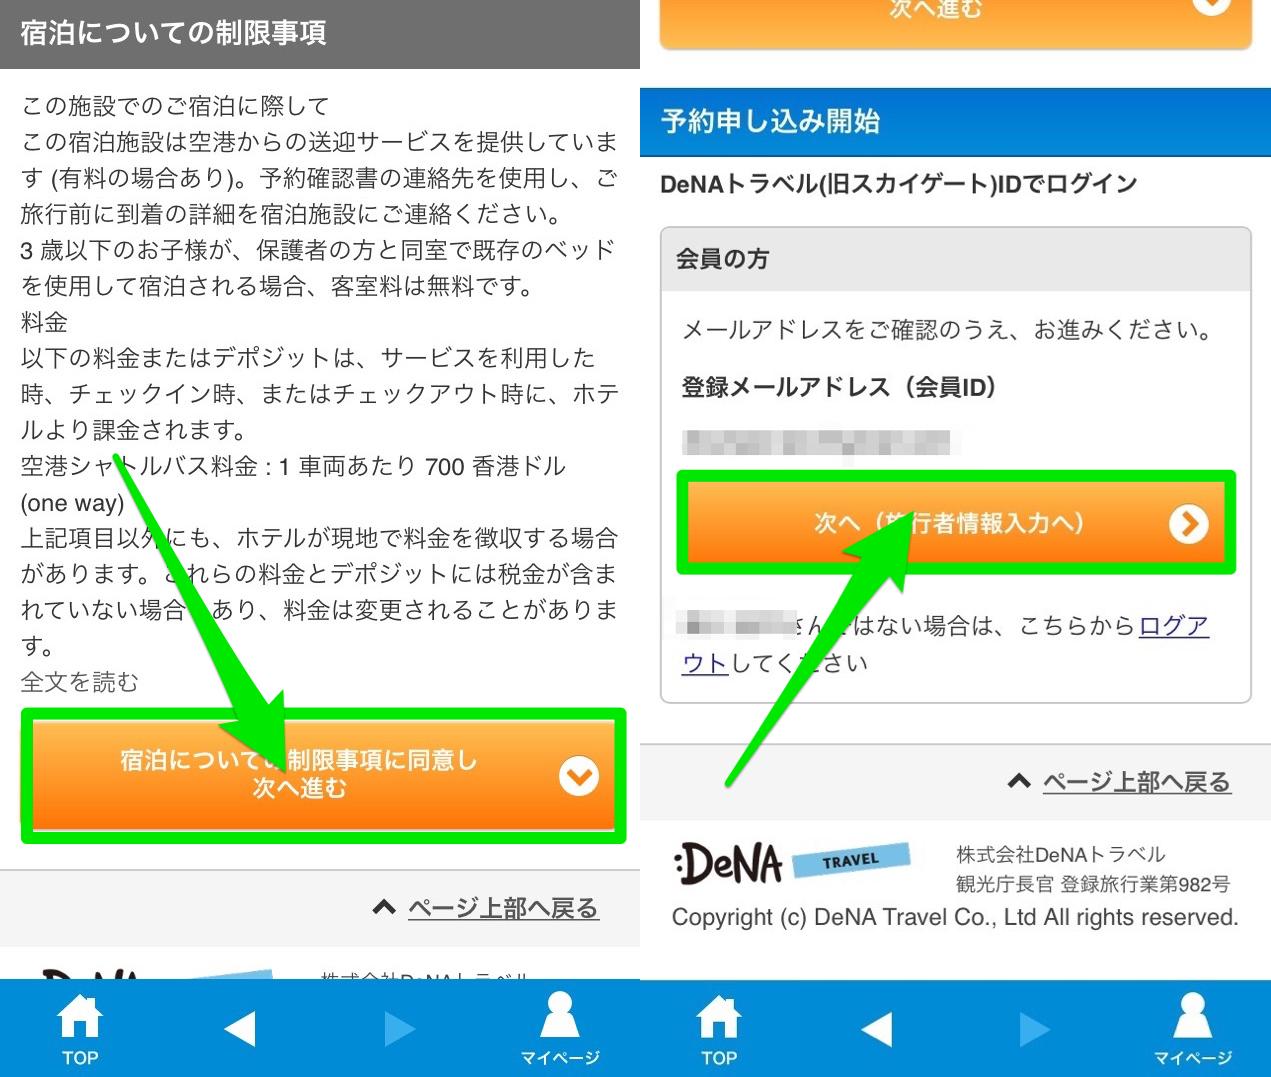 DeNAトラベルアプリの海外ホテル予約で宿泊制限事項を確認